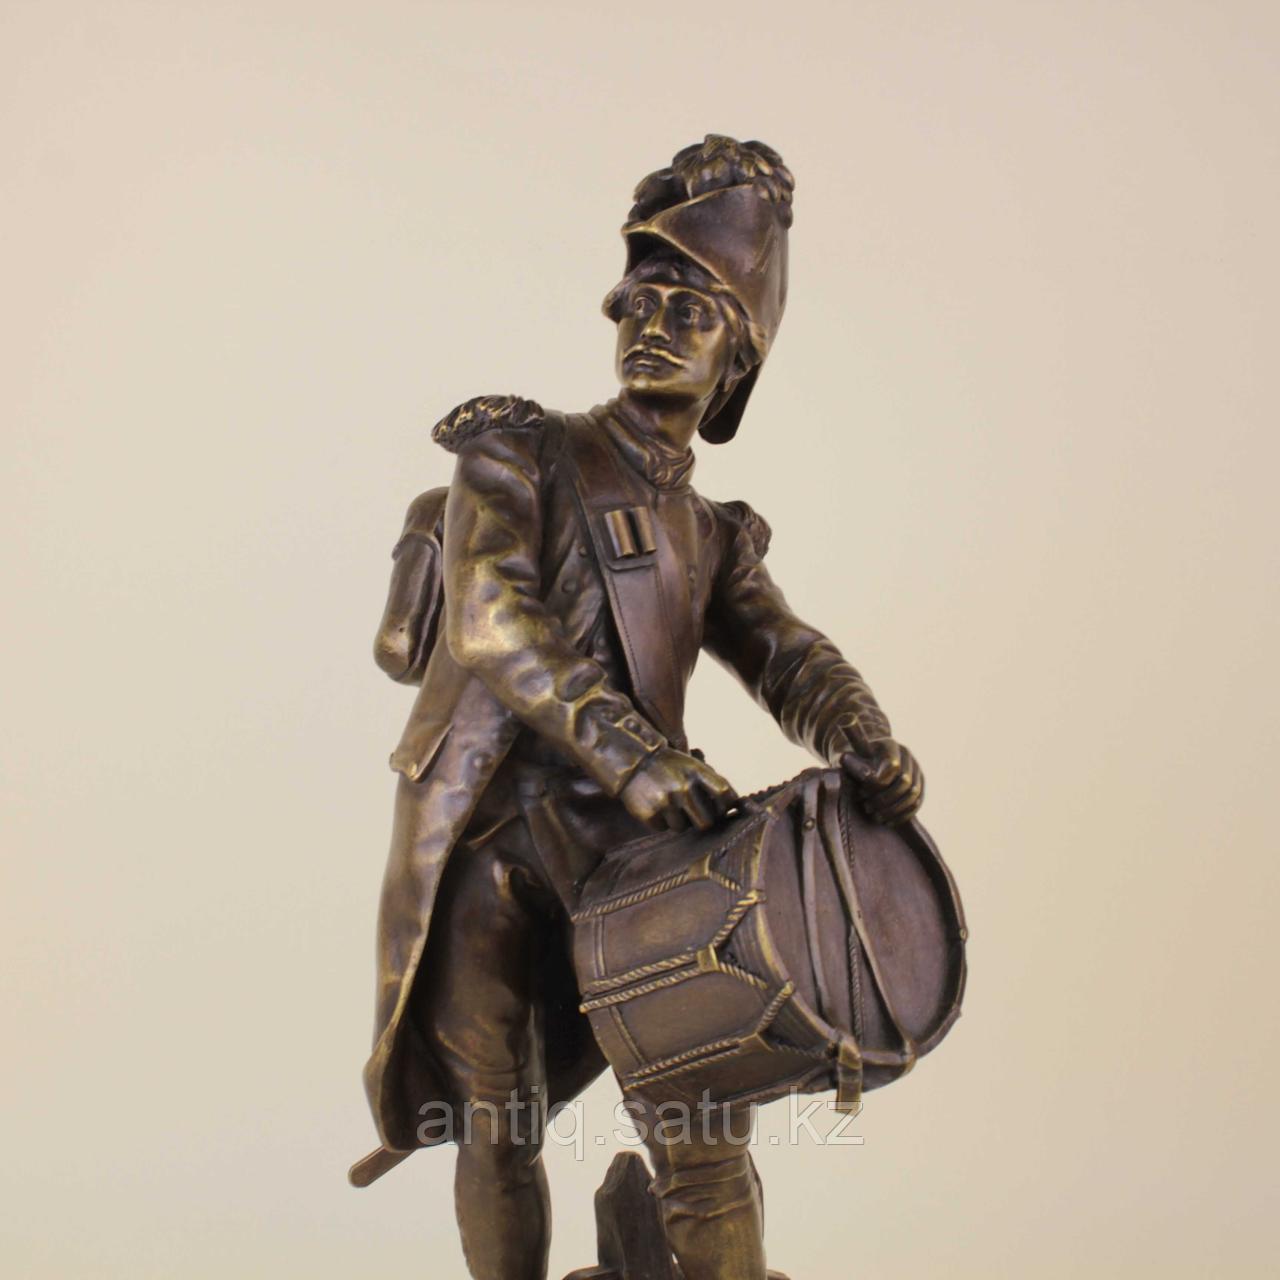 Барабанщик. Автор Etienne Henri Dumaige (1830-1888) - фото 5